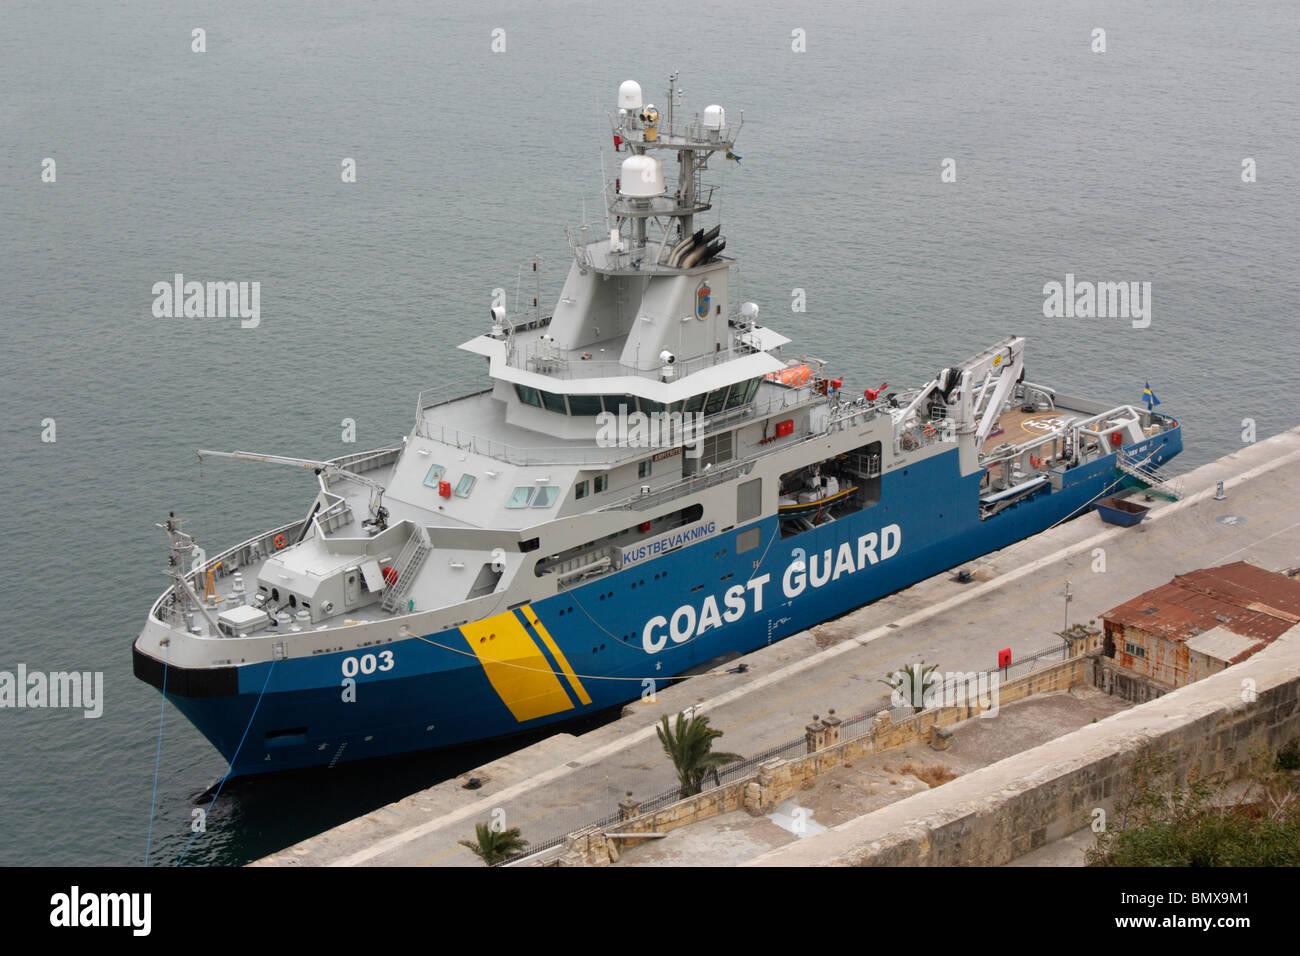 The Swedish Coast Guard vessel Amfitrite - Stock Image